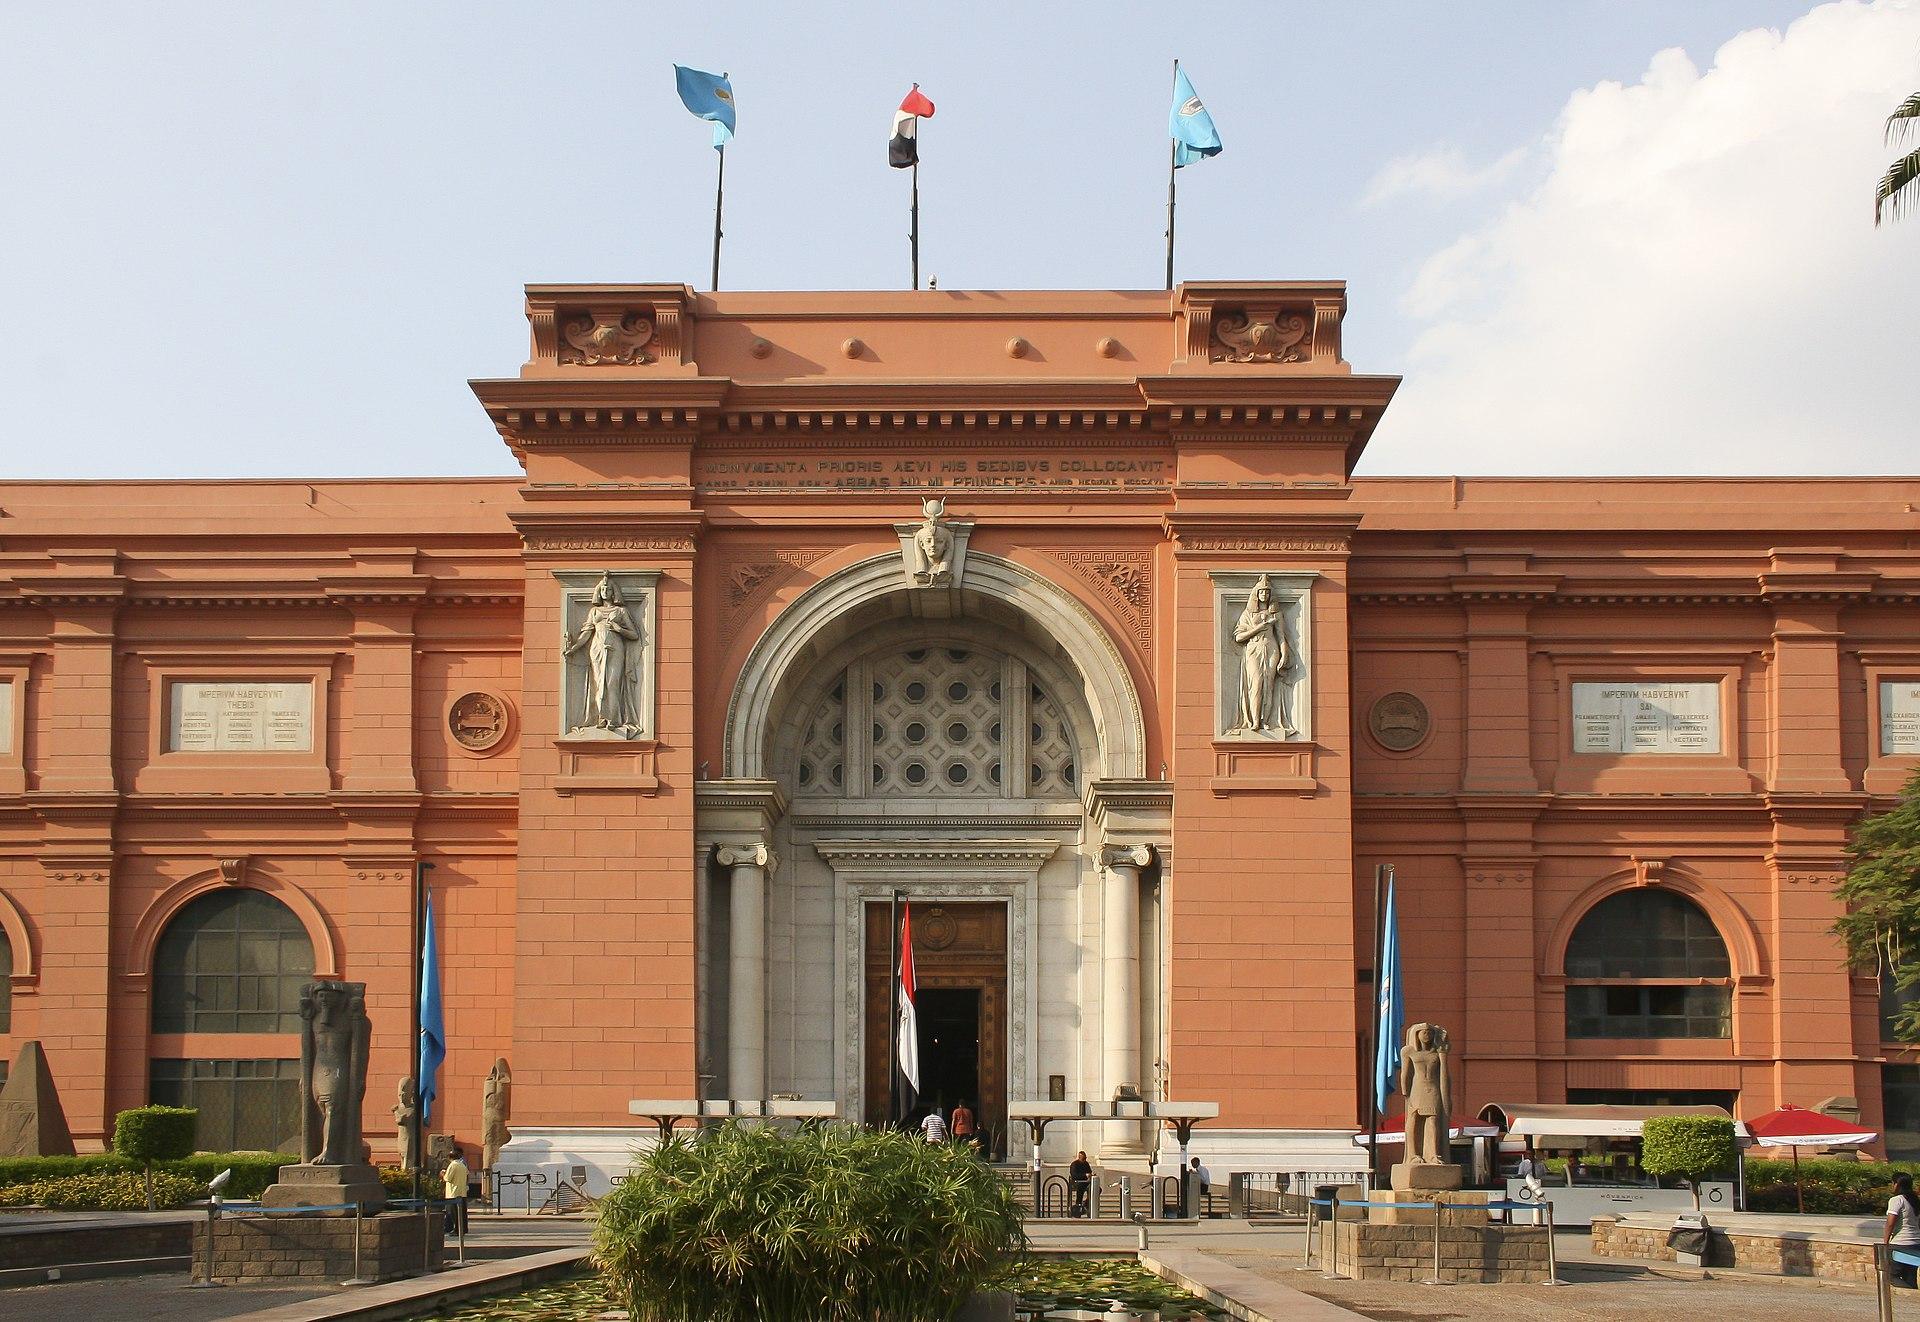 Fassade des Ägyptischen Nationalmuseums am Tahir Platz in Kairo. (c) CC BY-SA 3.0